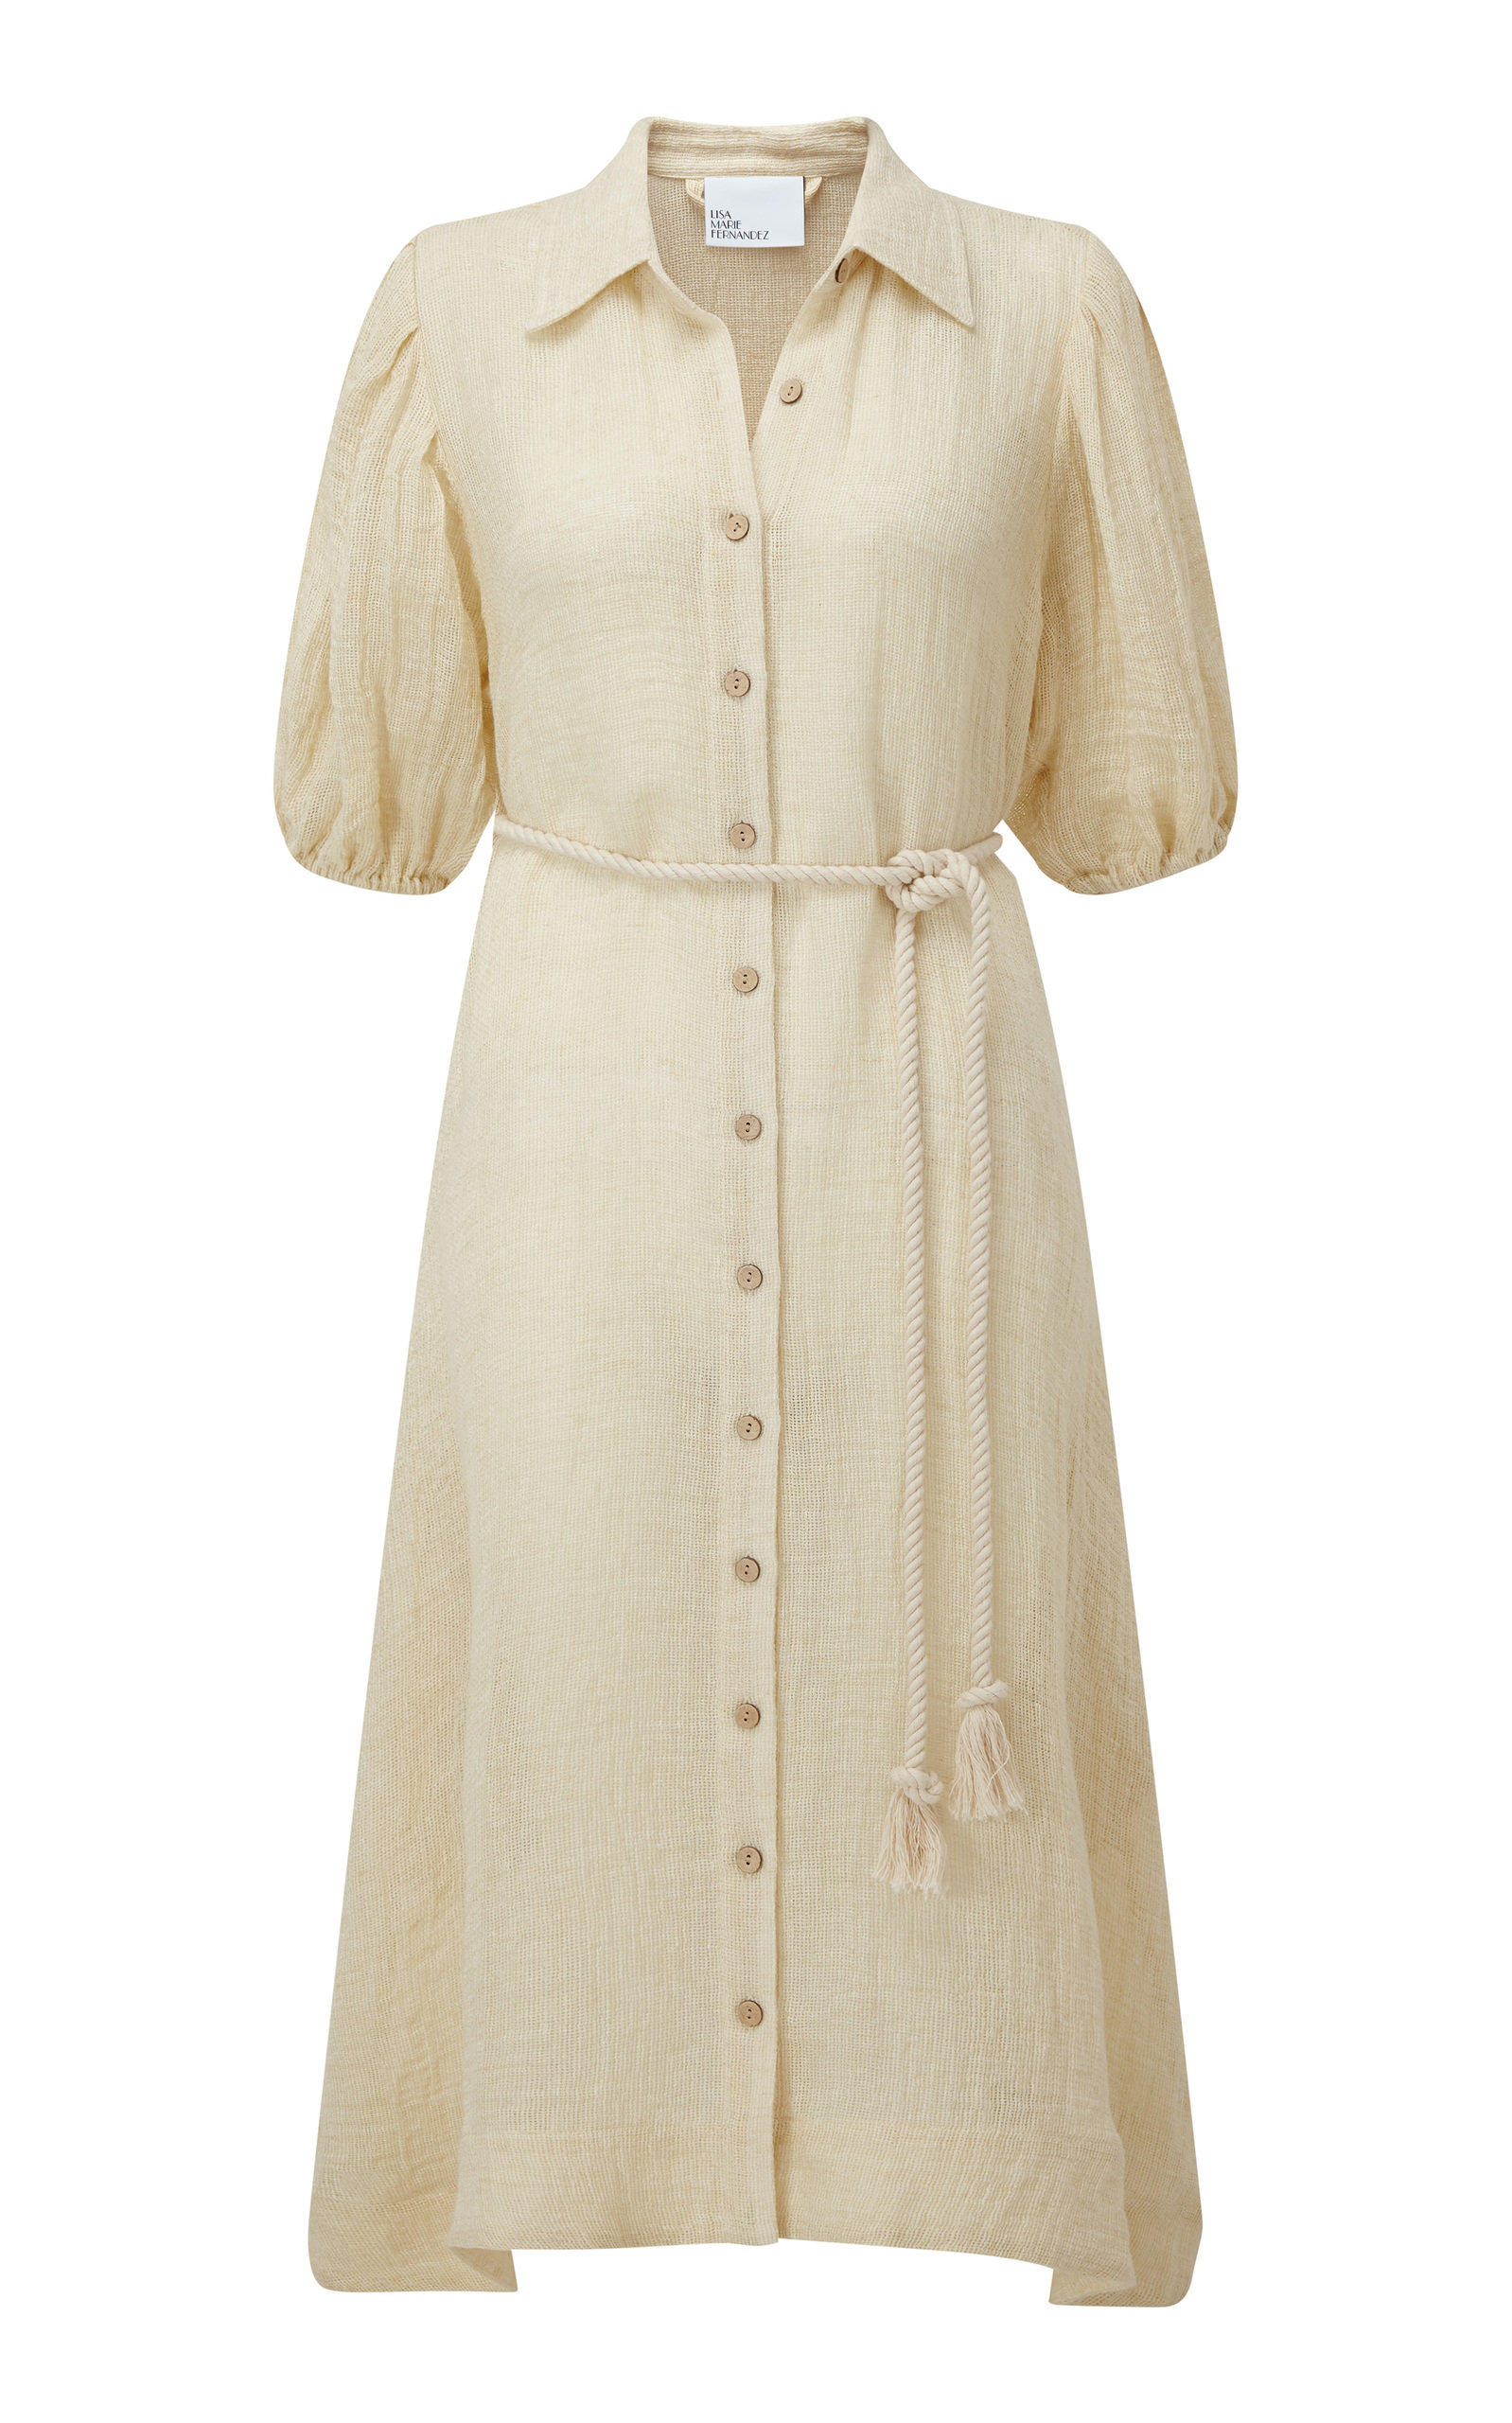 Buy Lisa Marie Fernandez Belted Linen-Blend Gauze Midi Shirt Dress online, shop Lisa Marie Fernandez at the best price